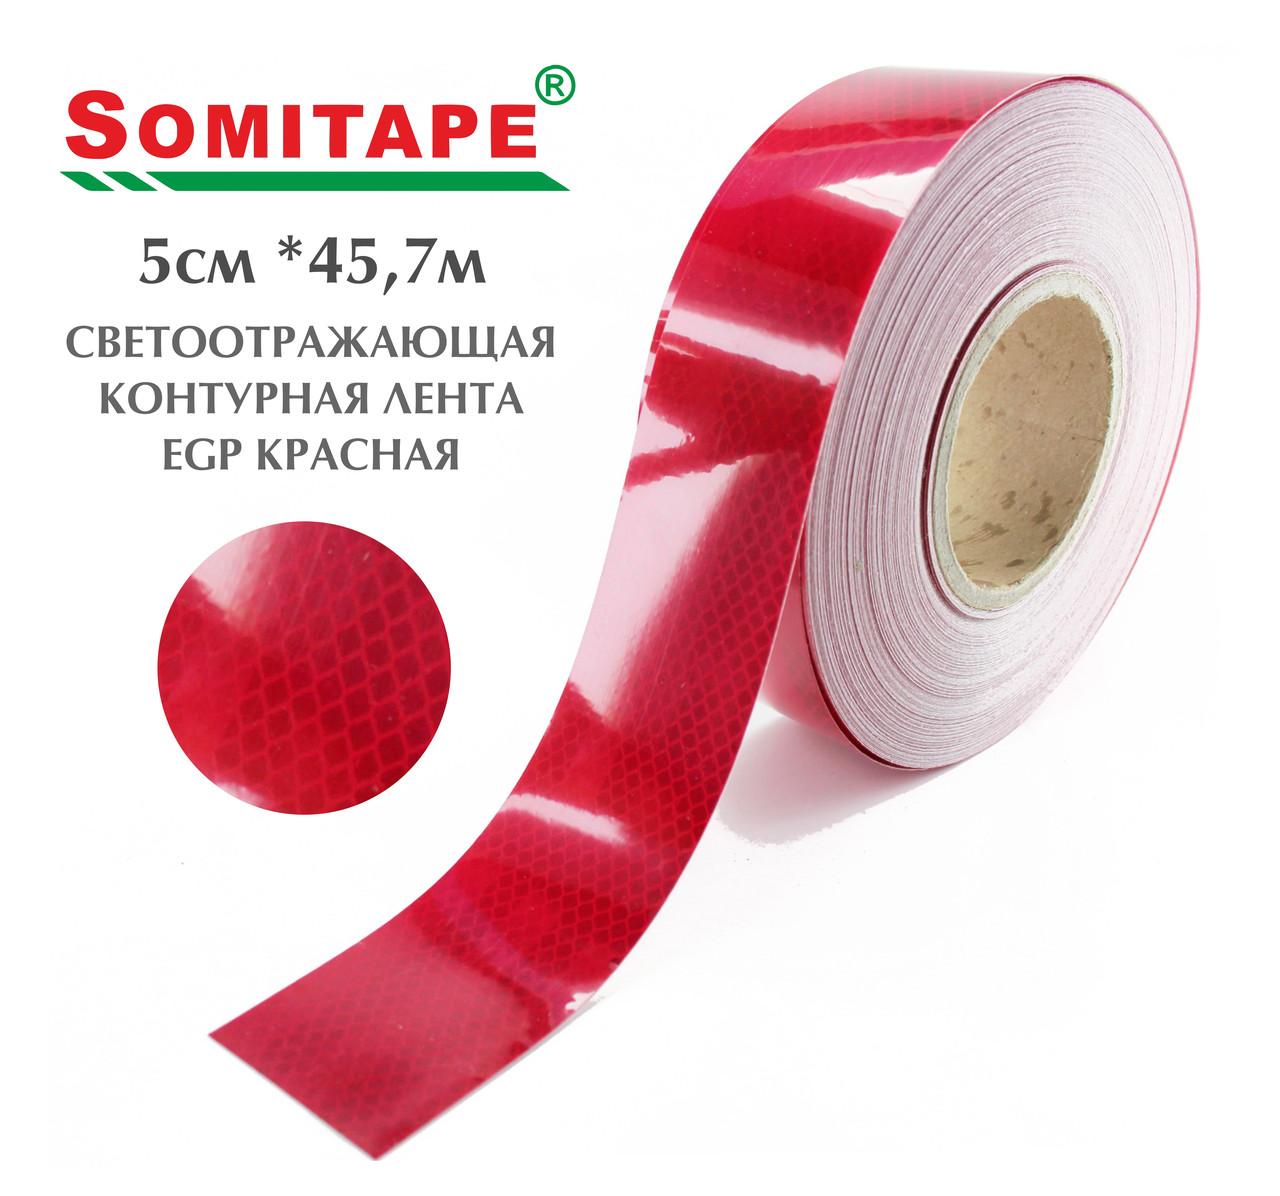 Светоотражающая контурная лента EGP красная (5смХ45,7м)